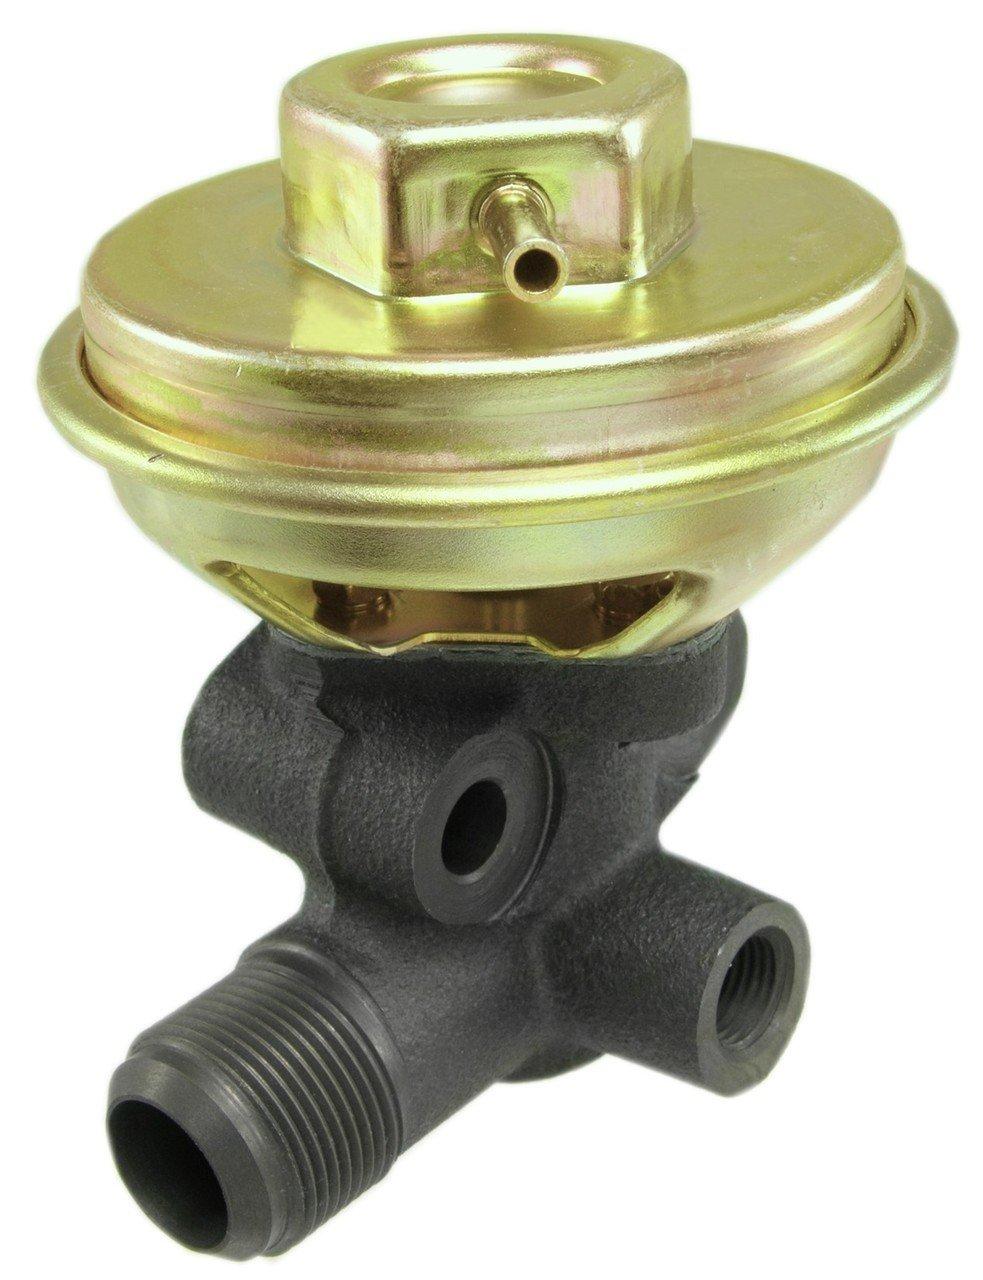 Airtex 4F1526 Exhaust Gas Recirculation Valve